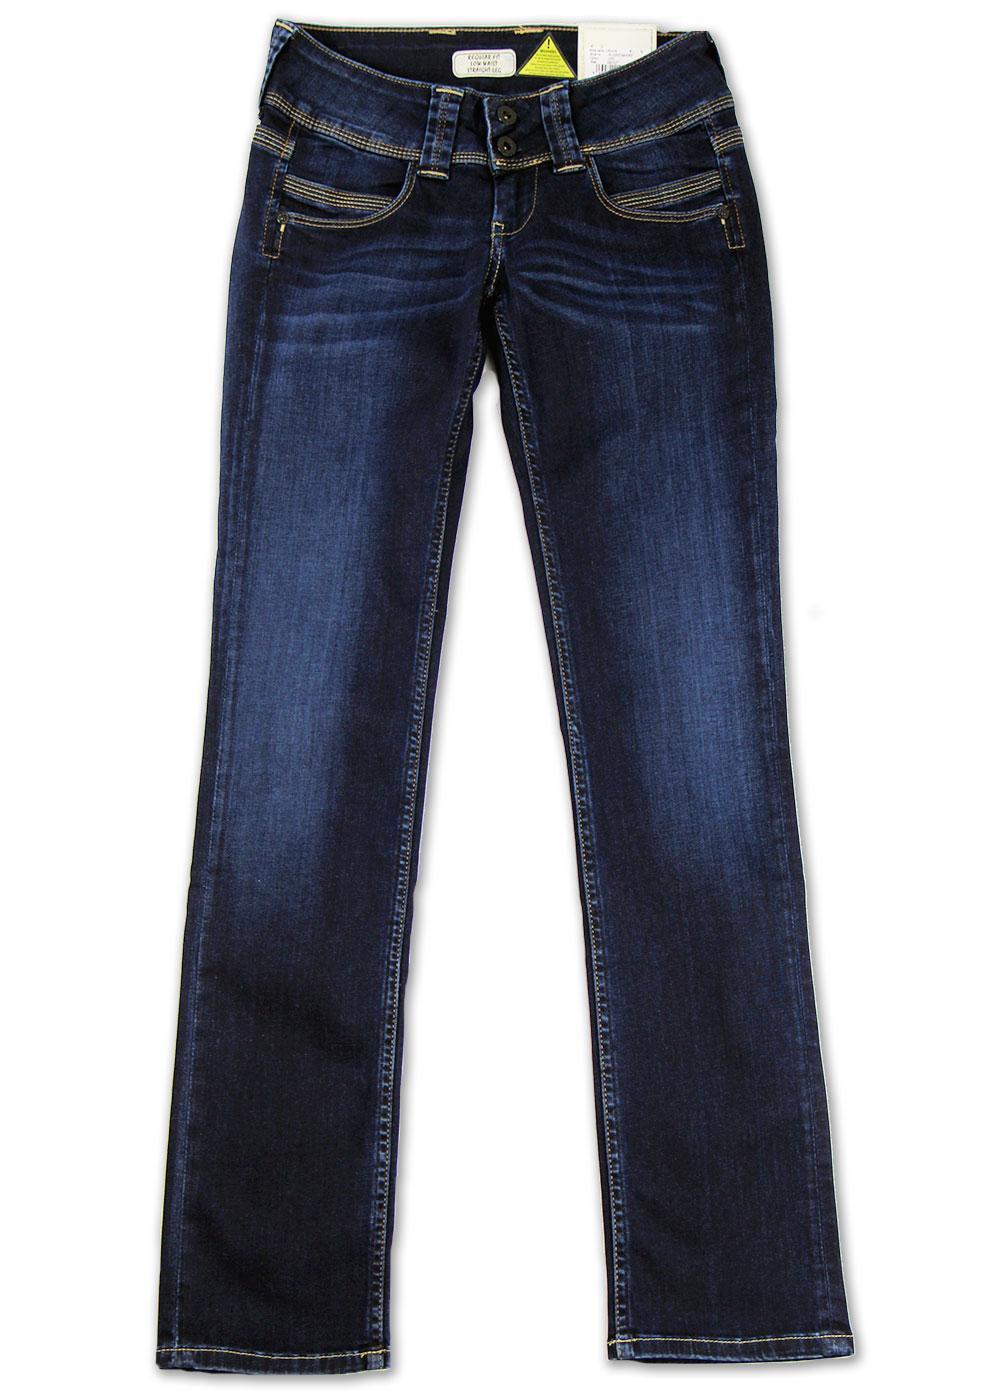 pepe jeans venus retro indie straight leg denim jeans blue. Black Bedroom Furniture Sets. Home Design Ideas